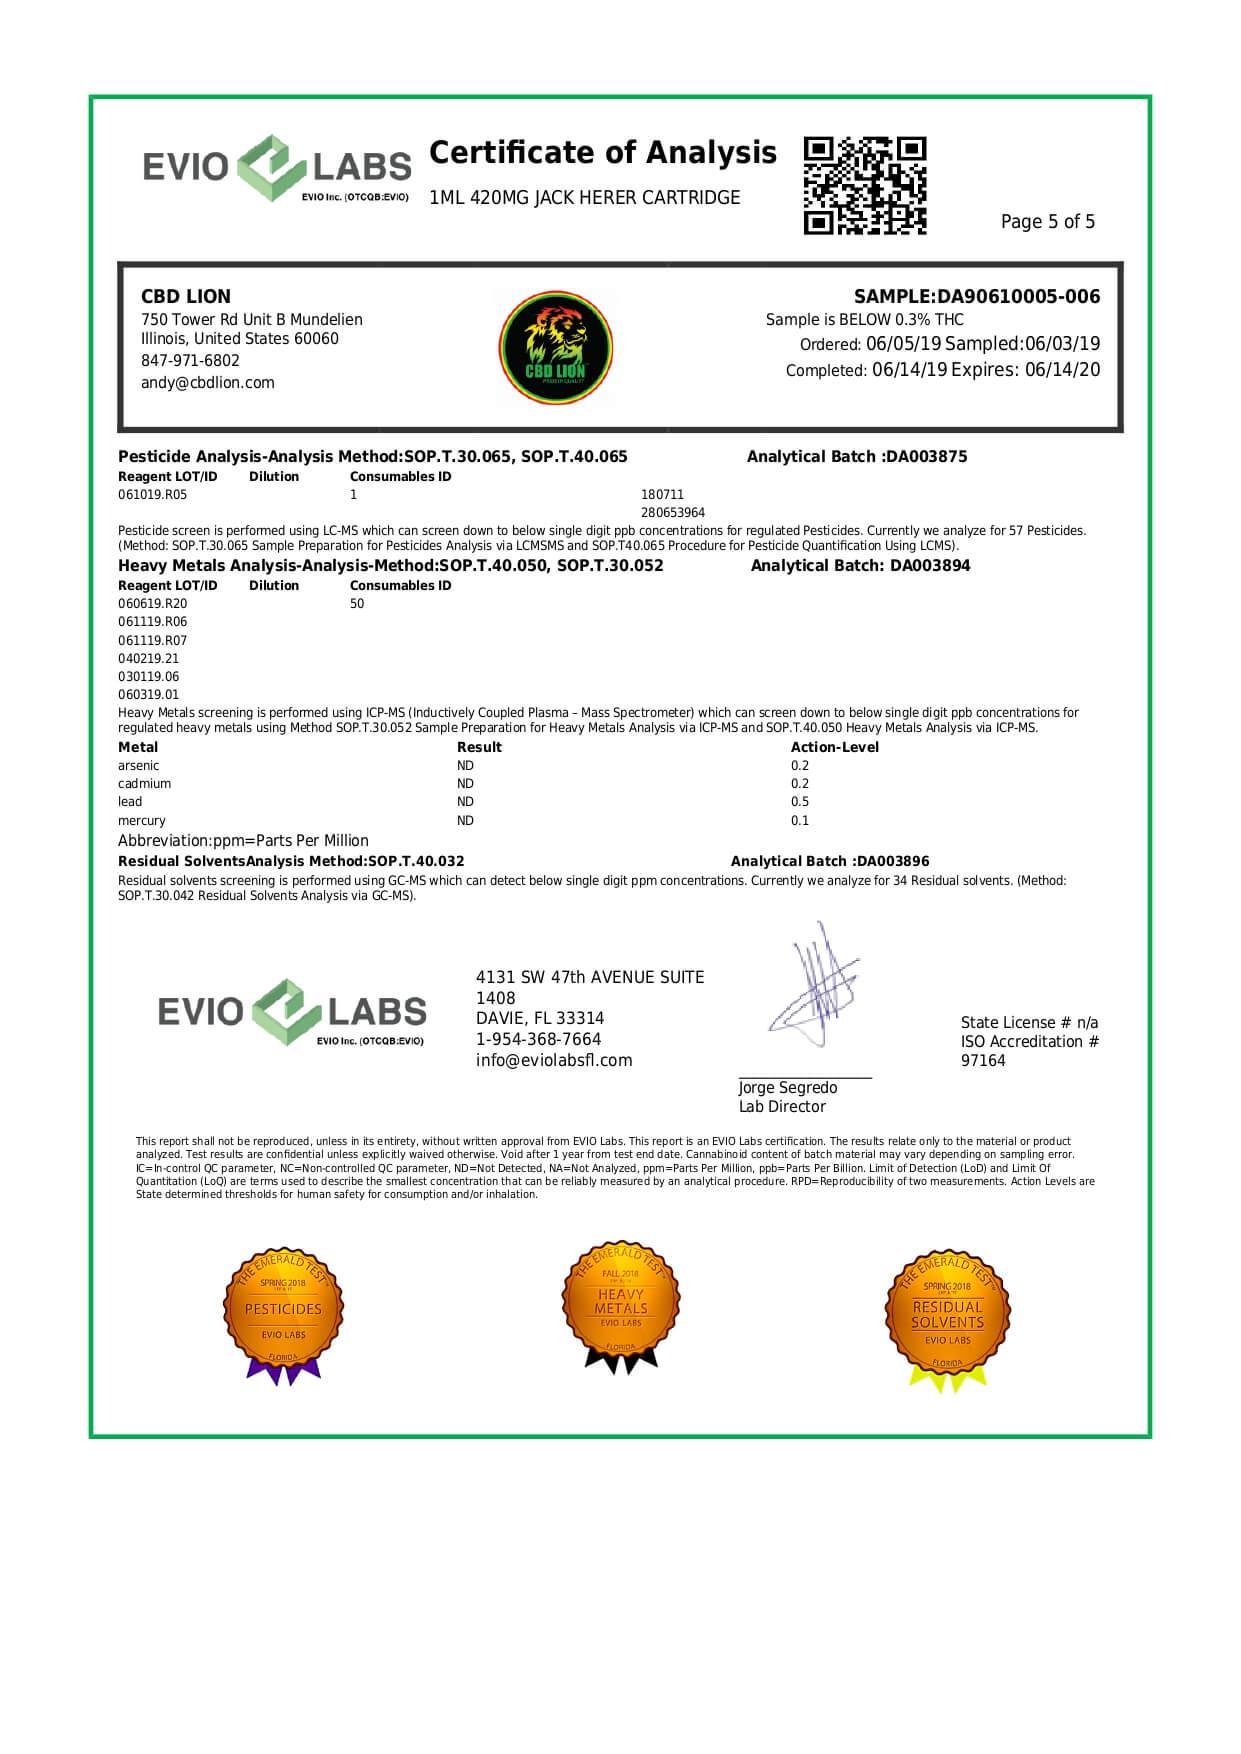 CBD Lion CBD Cartridge Jack Herer 420mg Lab Report